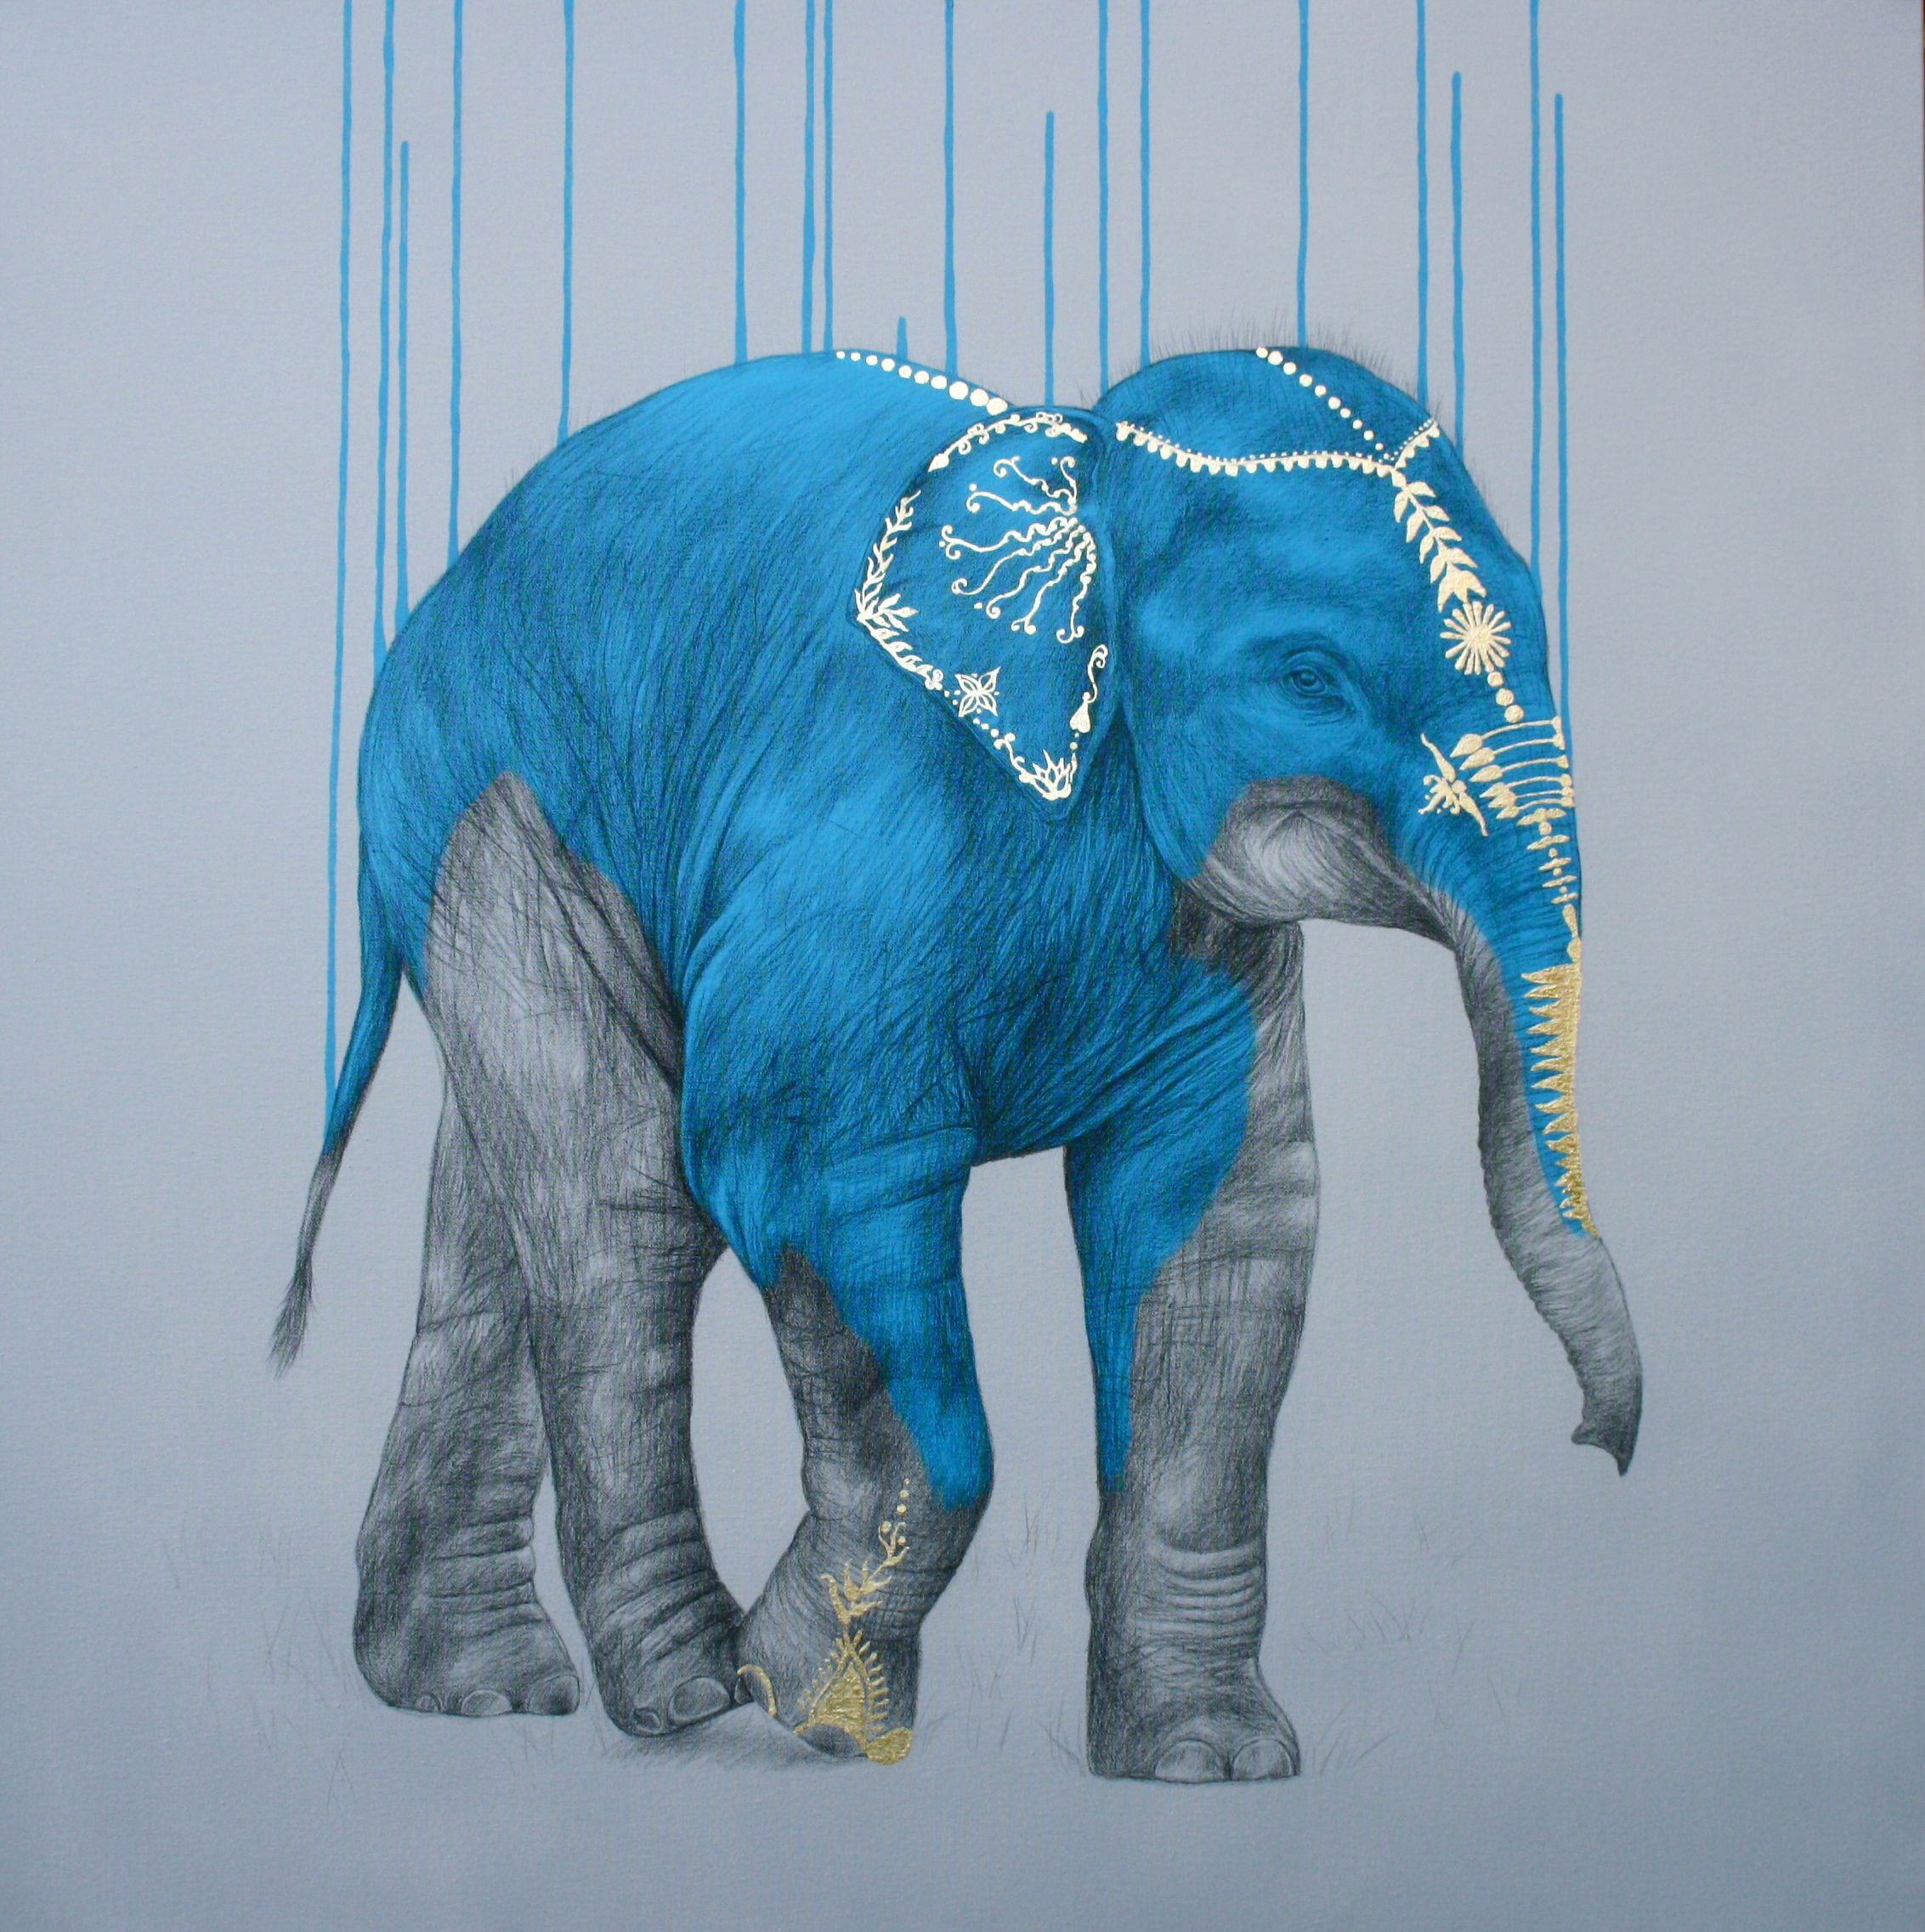 Acrylic spray paint and gold leaf on canvas 11 2015 the acrylic spray paint and gold leaf on canvas 11 2015 the elephant biocorpaavc Gallery